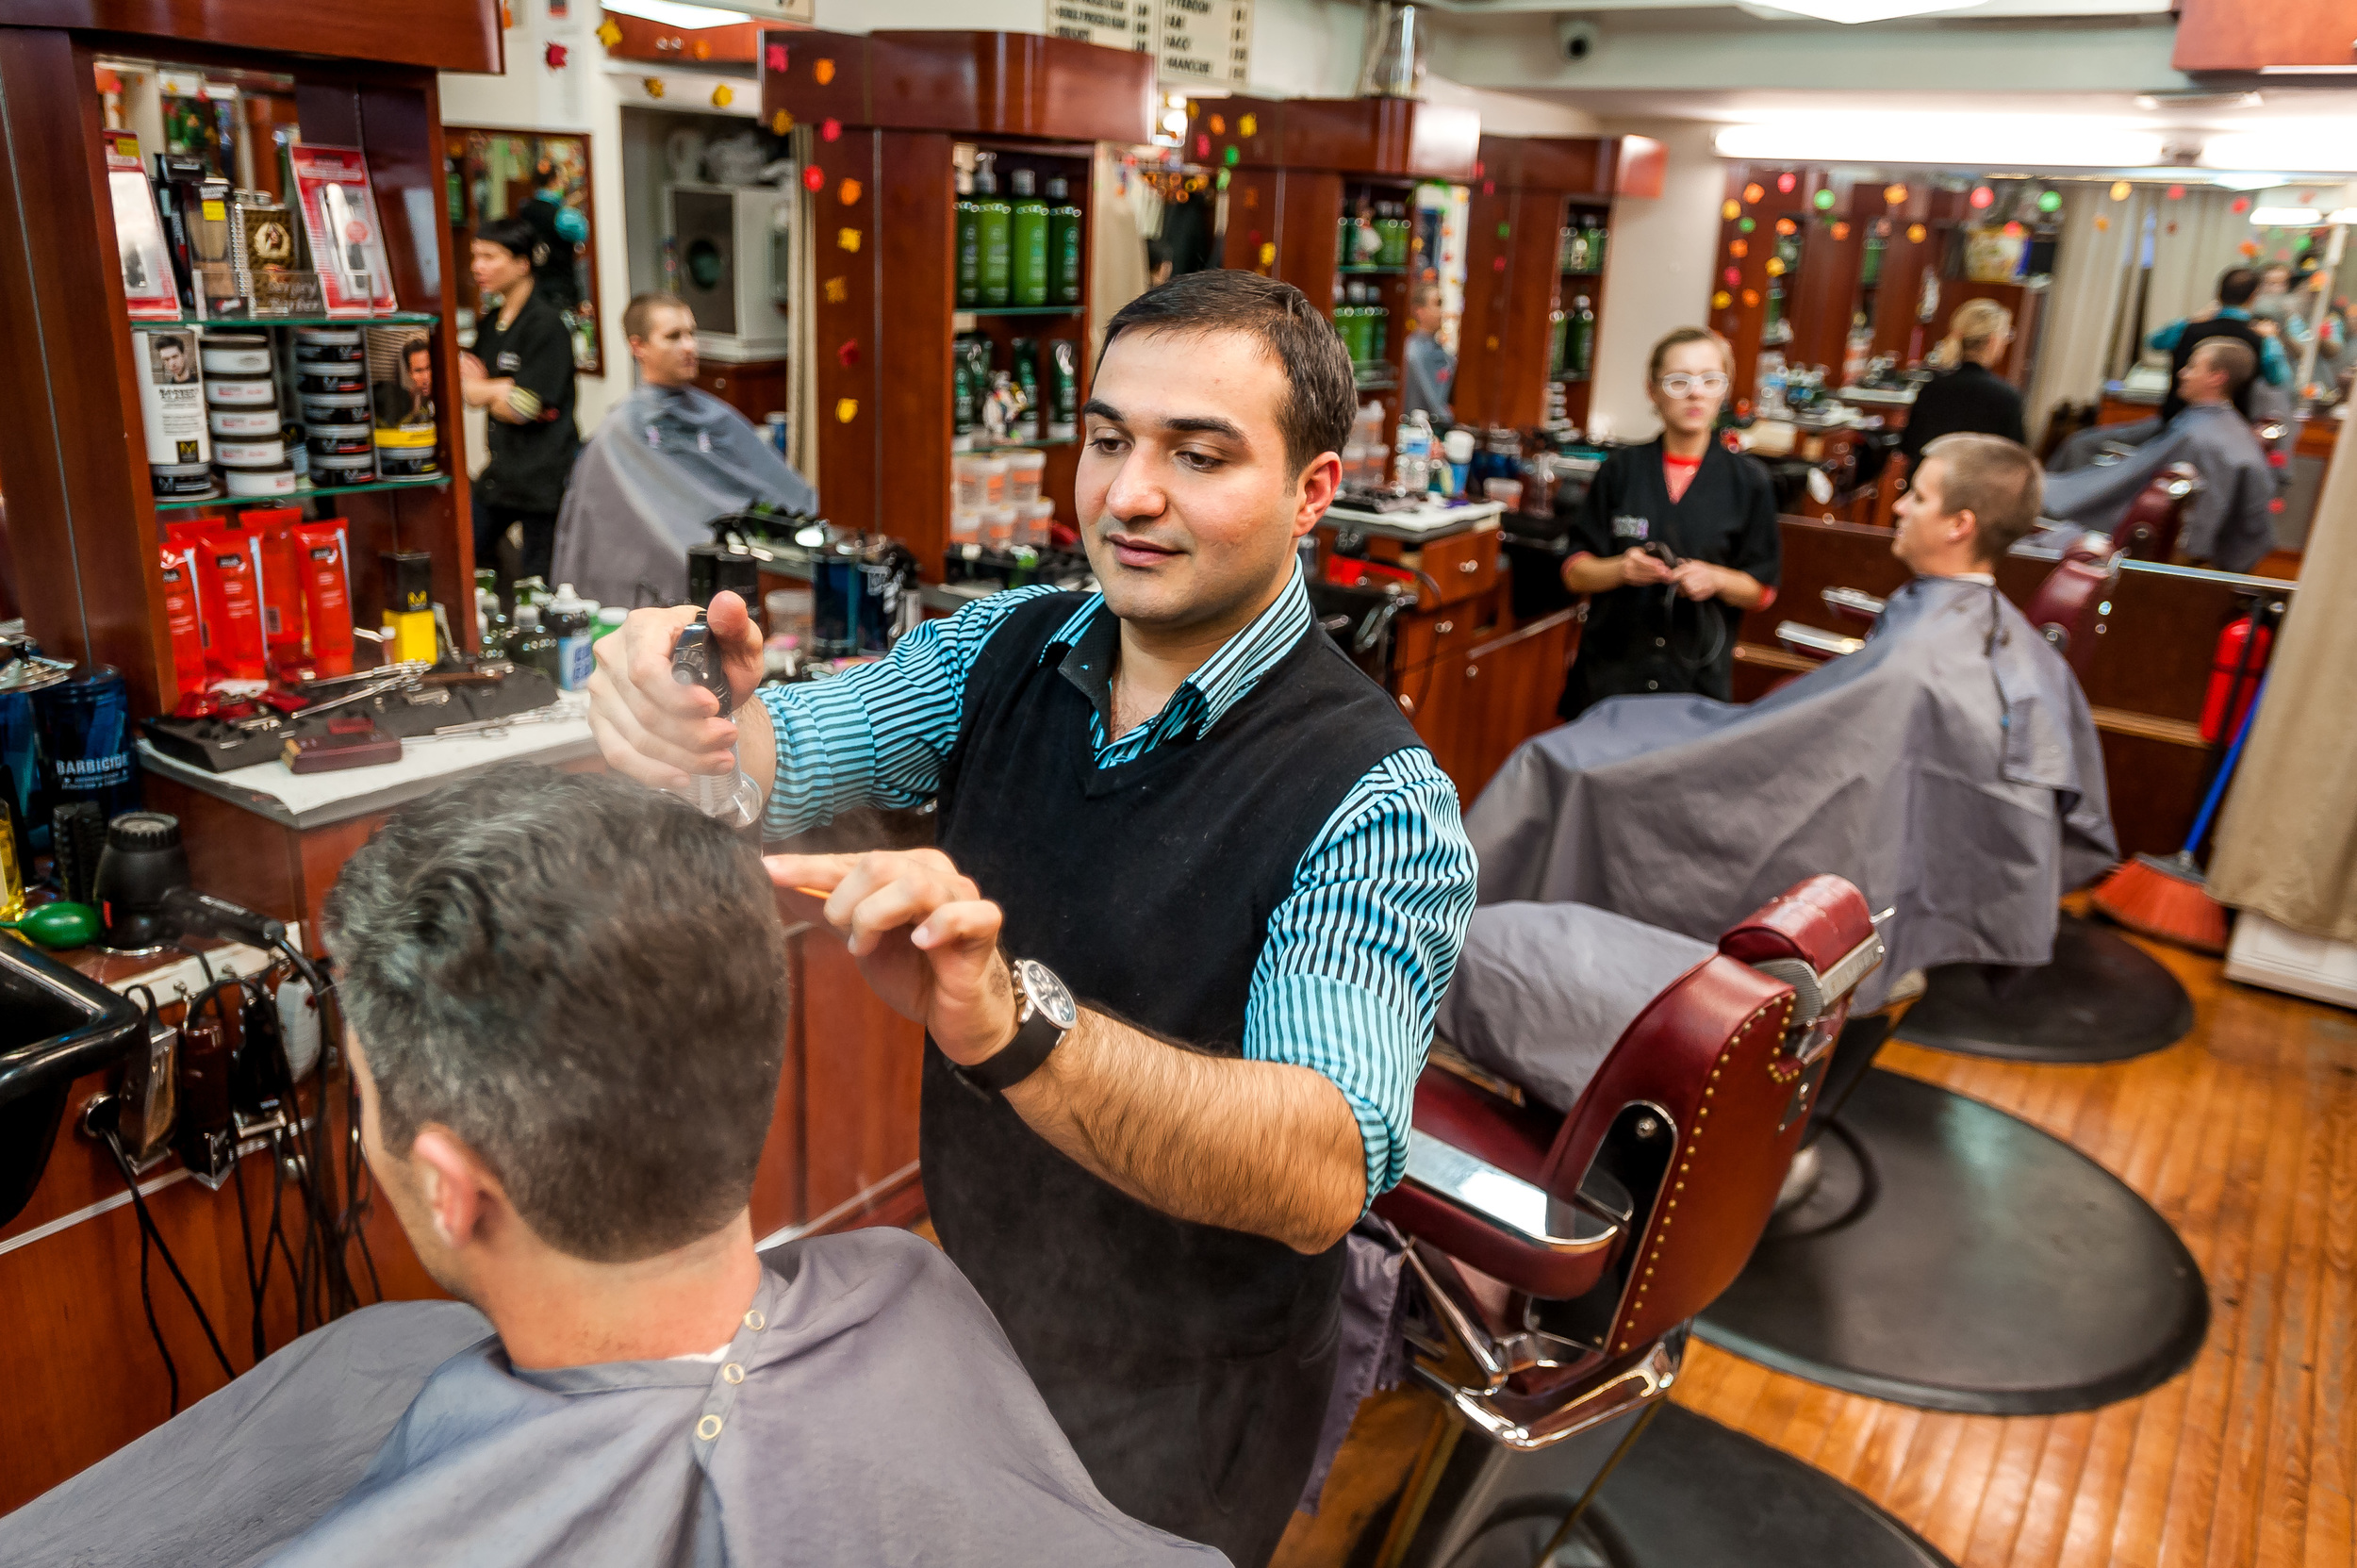 Clinton Street Barber Shop